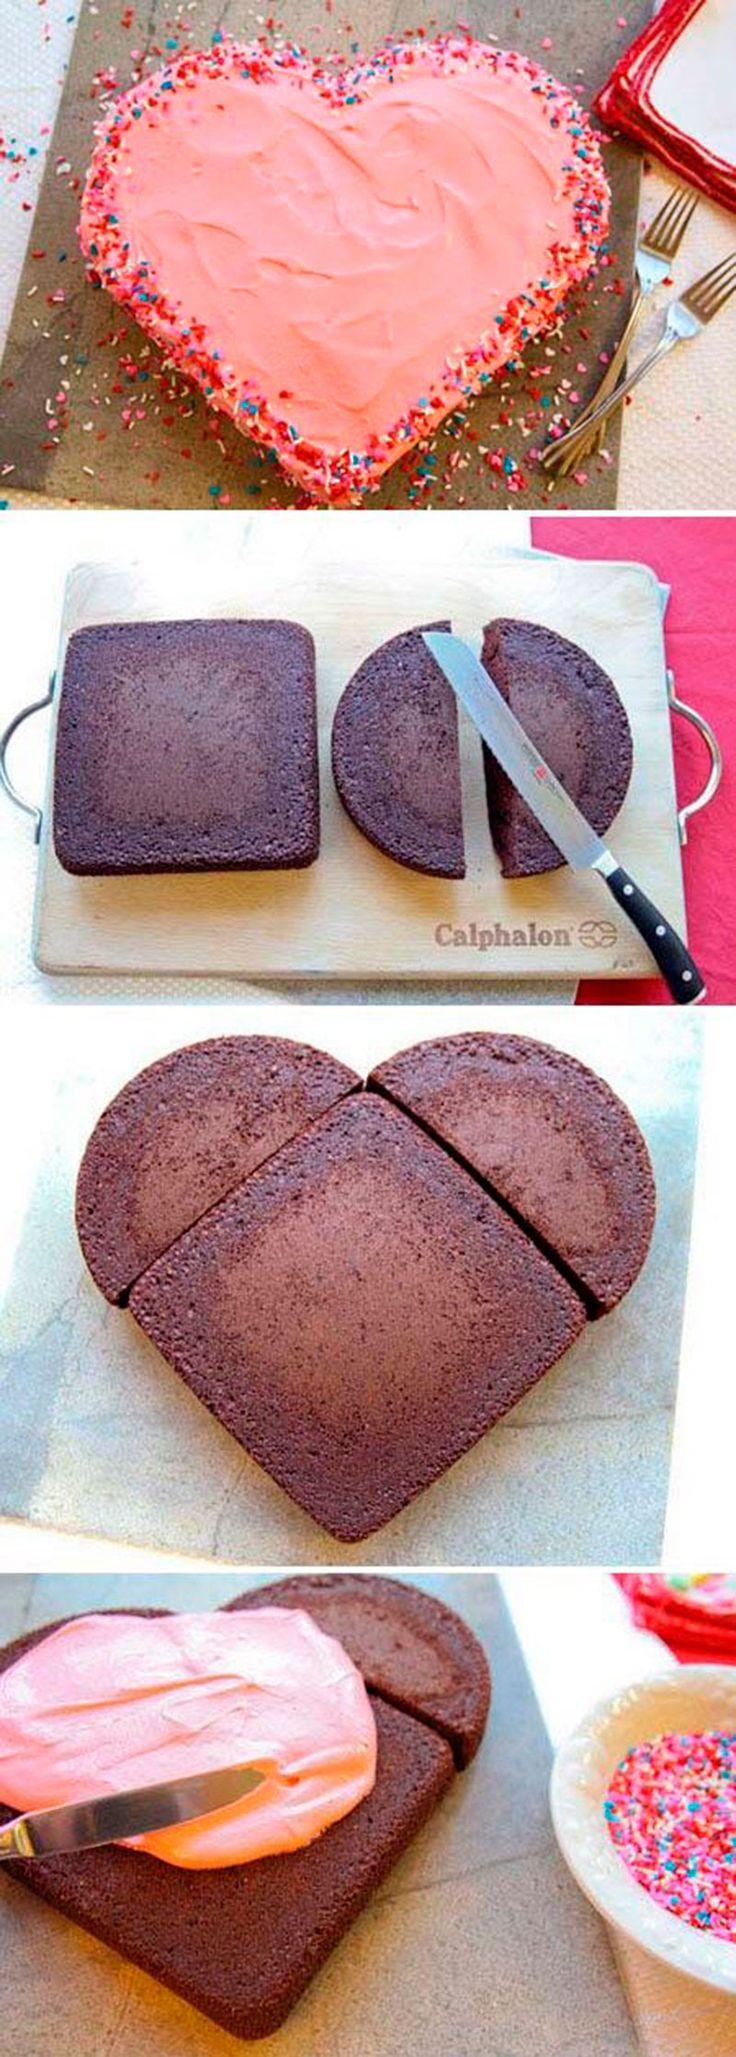 Montar bolo infantil